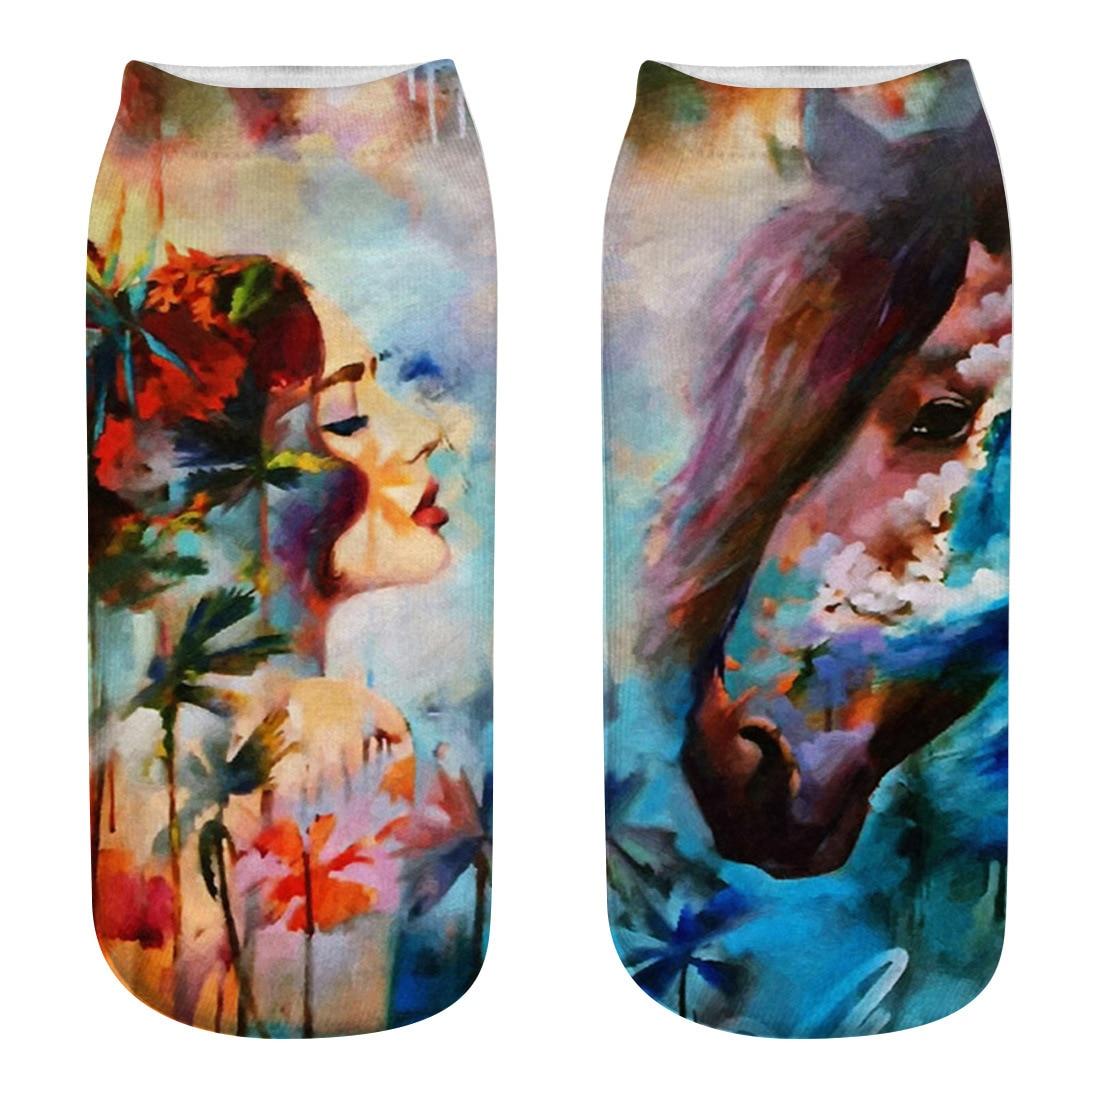 2018 Women /Man 3D Print Cute Low Cut Ankle Sock Harajuku Oil Painting Personality Printing Pattern Casual Funny Socks